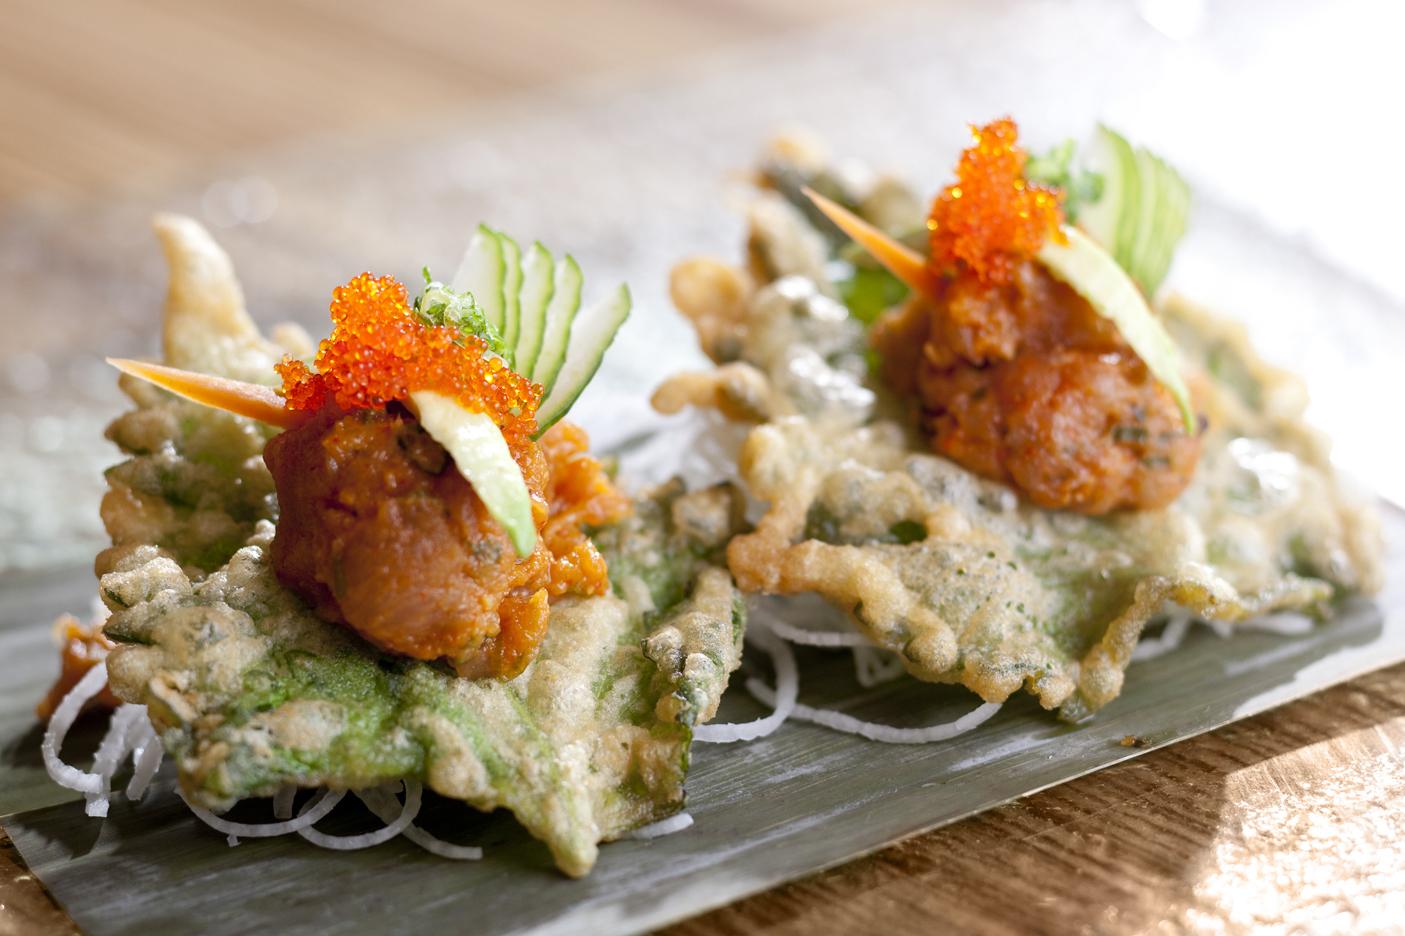 Geoff_Cardin_Food_Japanese_Natchos.jpg